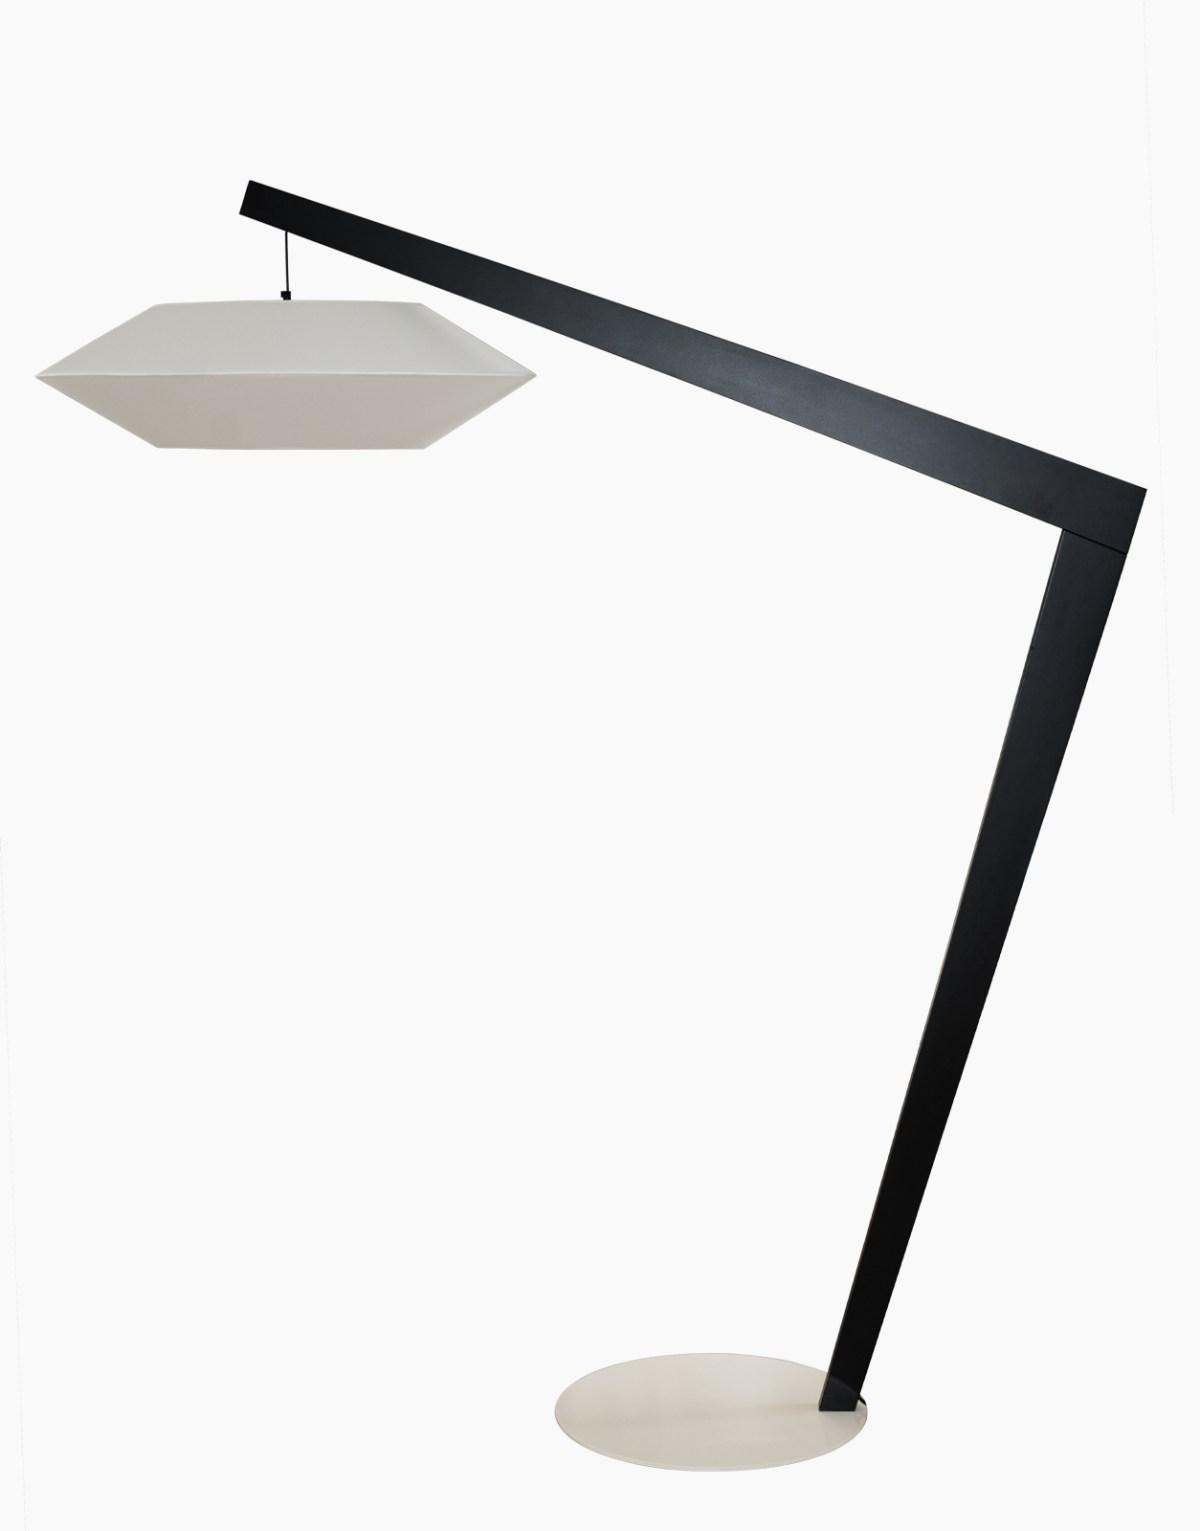 #decoration #decointerieur #design #bedesign #sodesign #follow #solutiondesign #solutiondesignfr #france #venteenligne #mobilier #luminaire #deco #showroom #interieur #designer #flamandluce